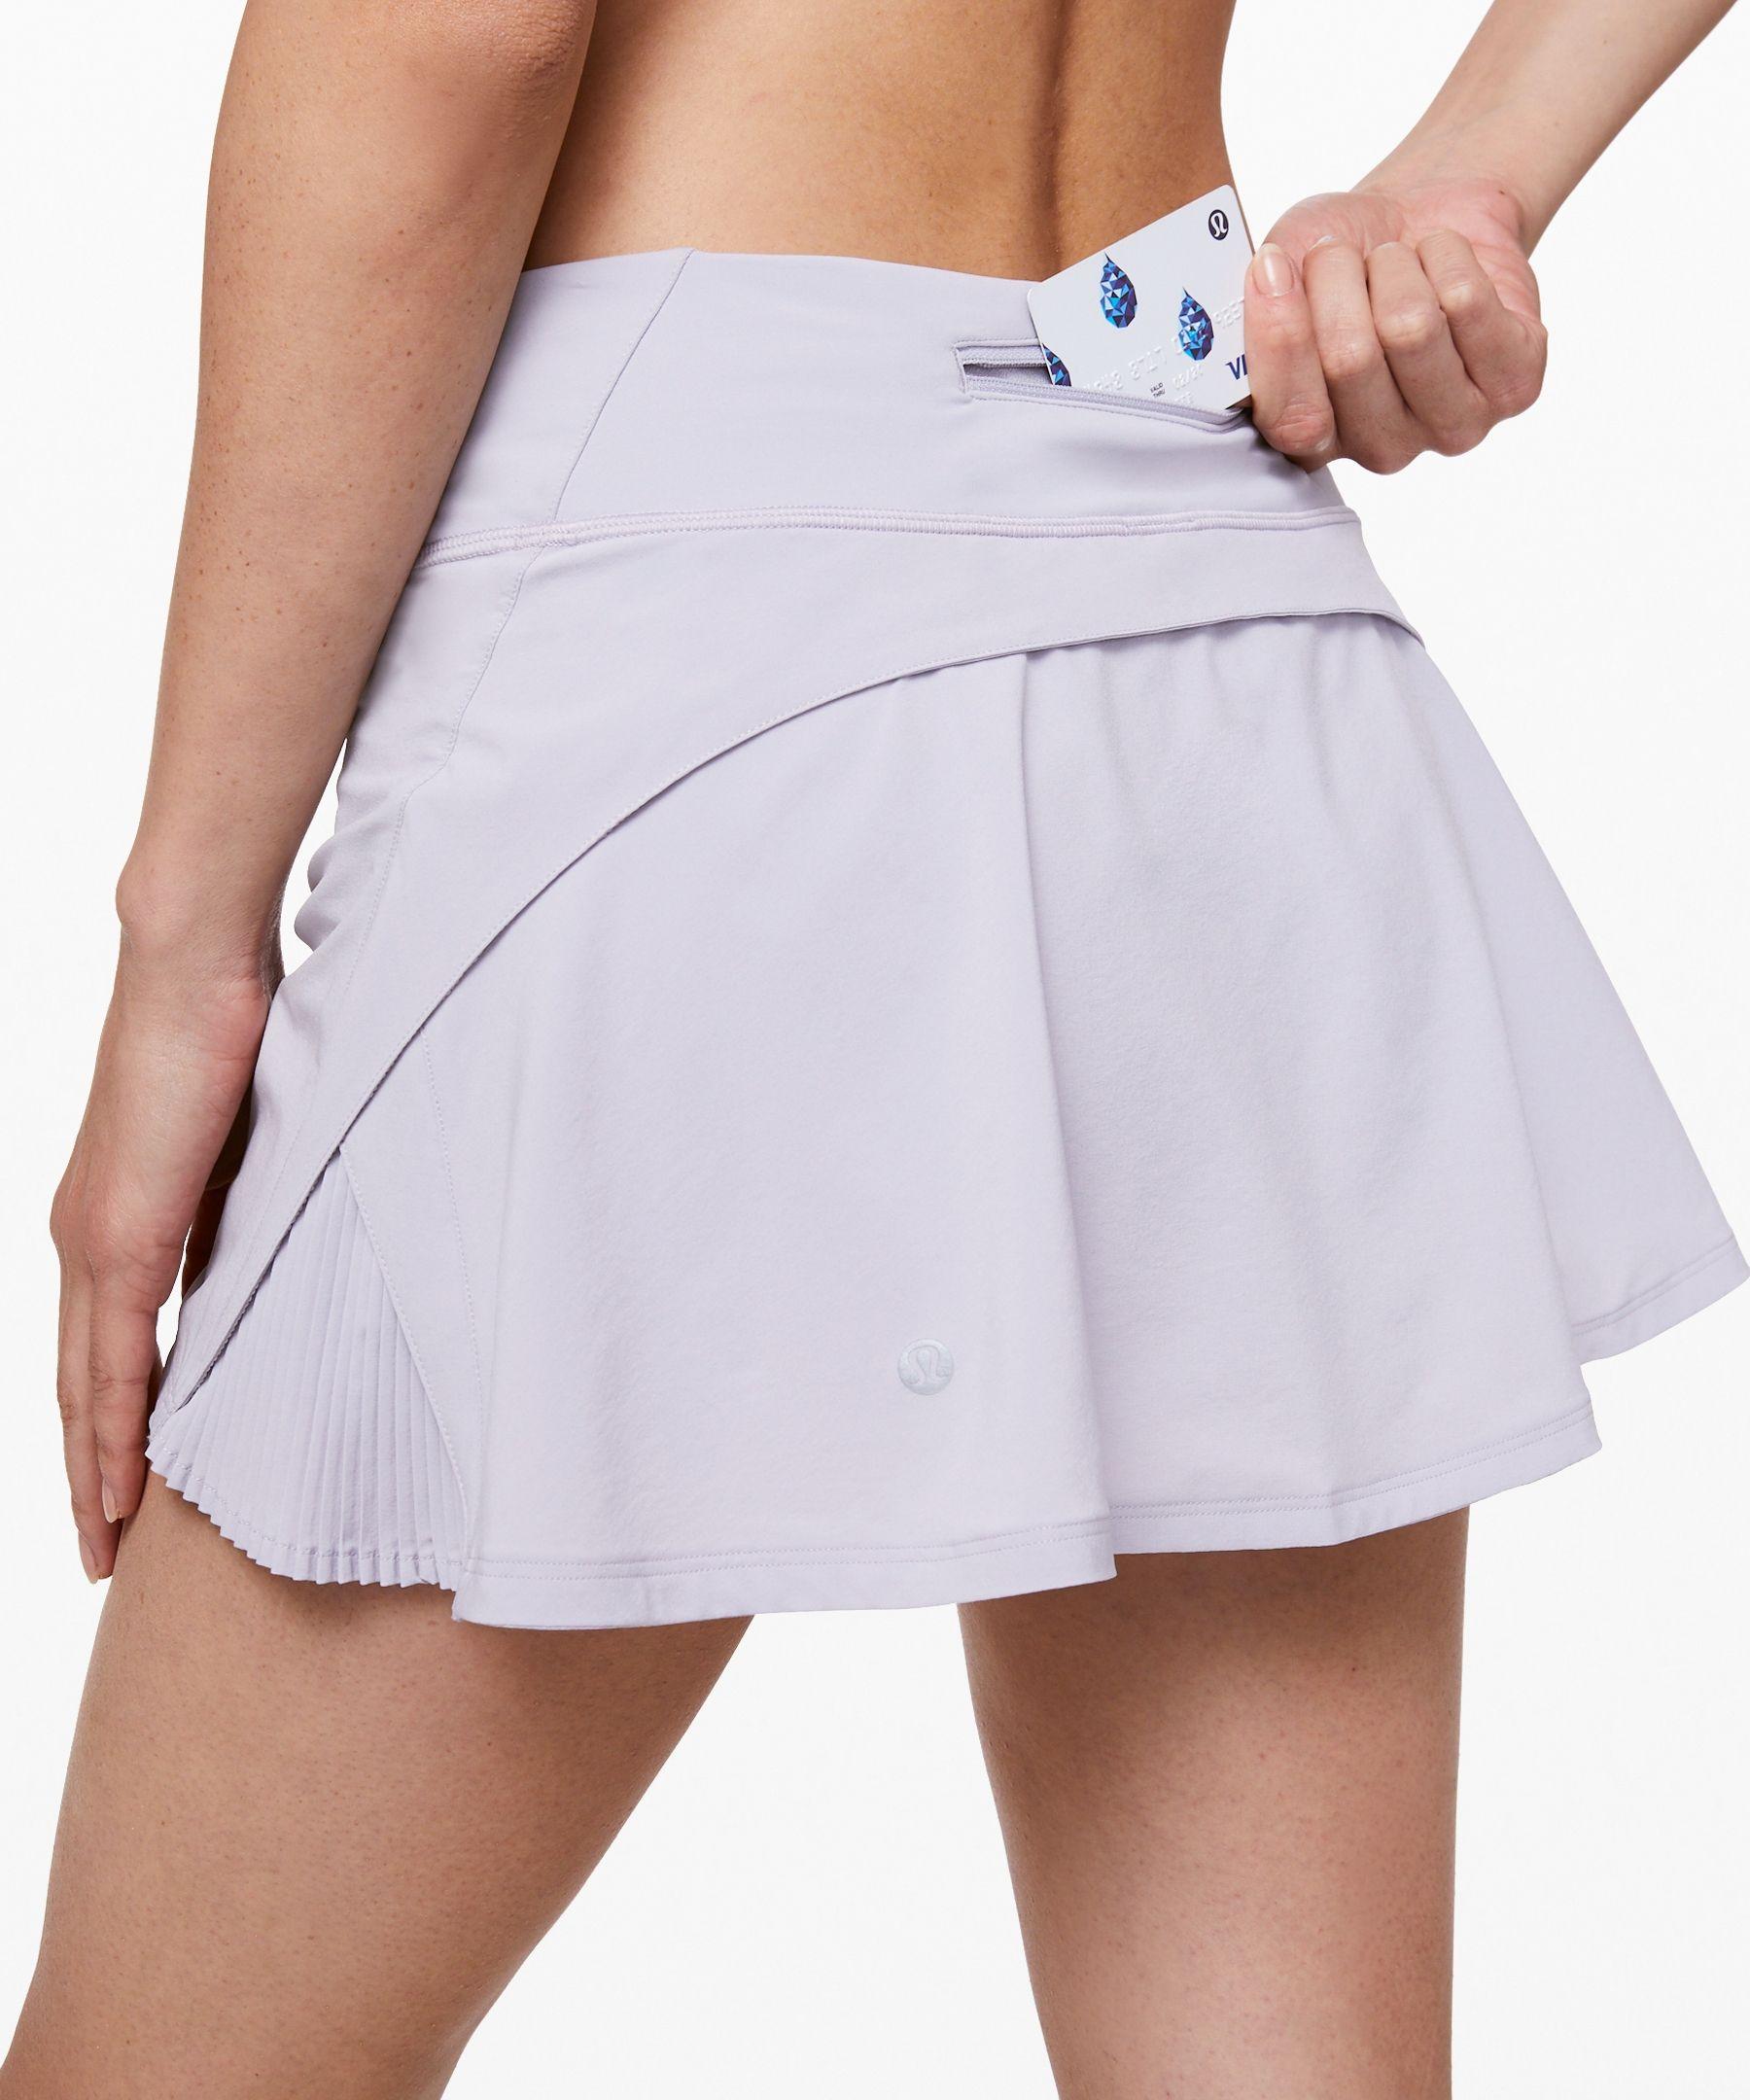 Play Off The Pleats Skirt 13 Women S Skirts Lululemon Lululemon Outfits Tennis Skirt Outfit Womens Skirt